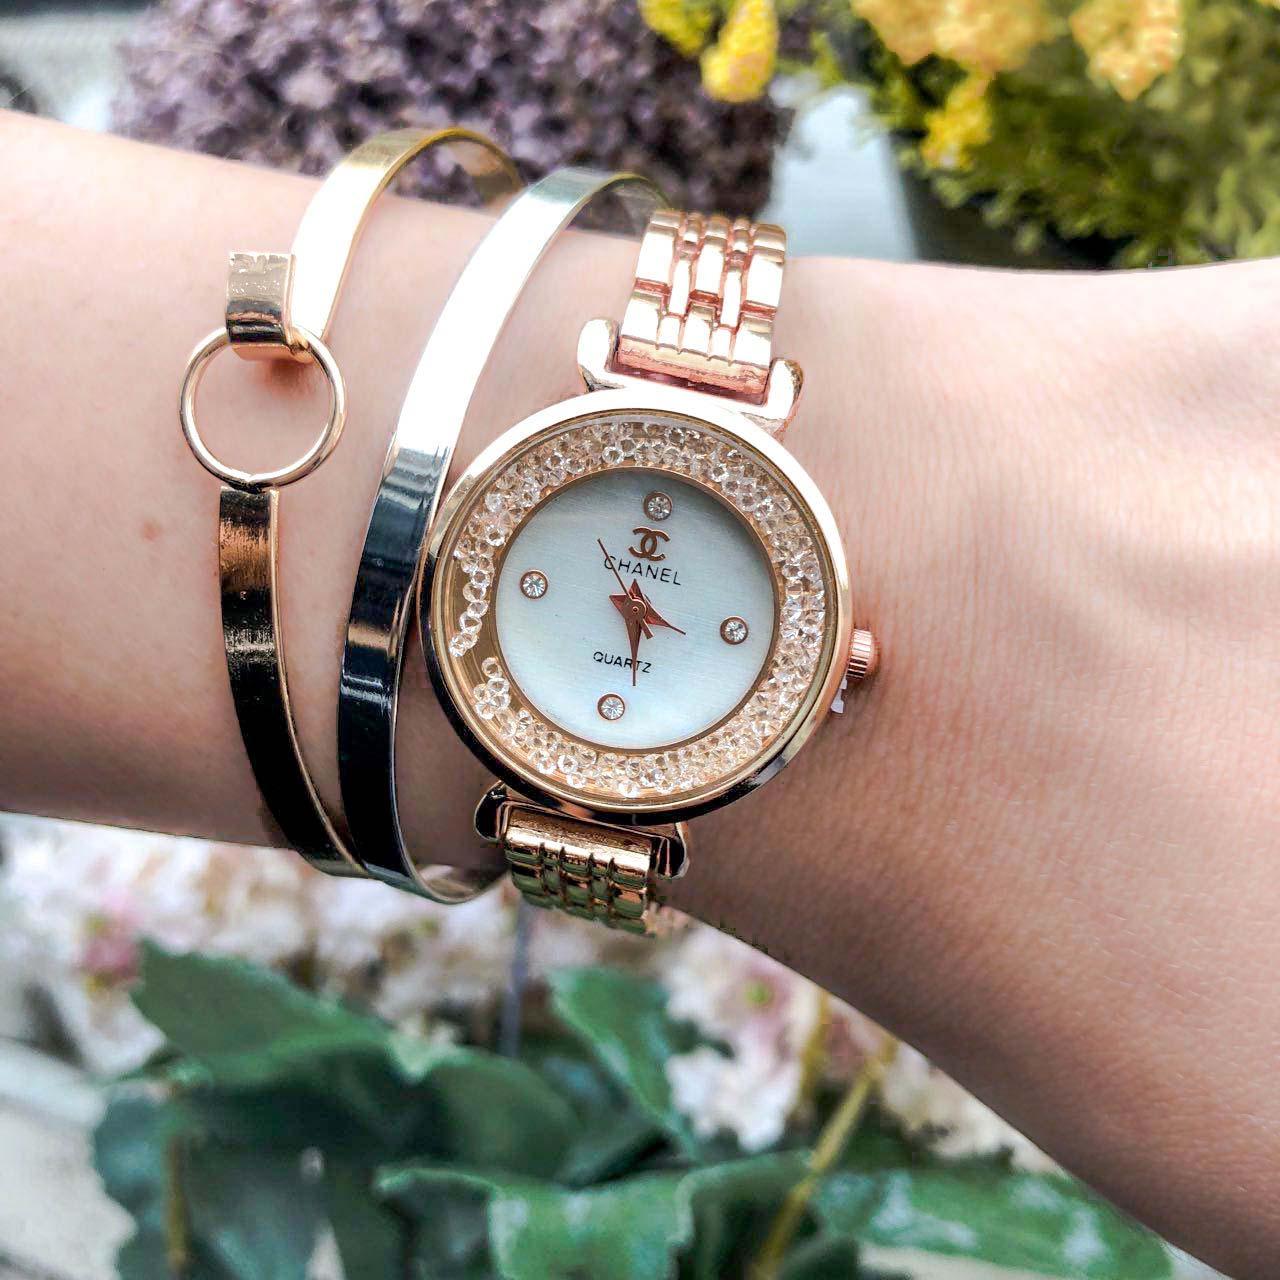 Jam Tangan CHANEL Fashion Watch Diamond Frame Rose Gold Frame+Rose Gold Dial+Rose Gold Band CHAW01